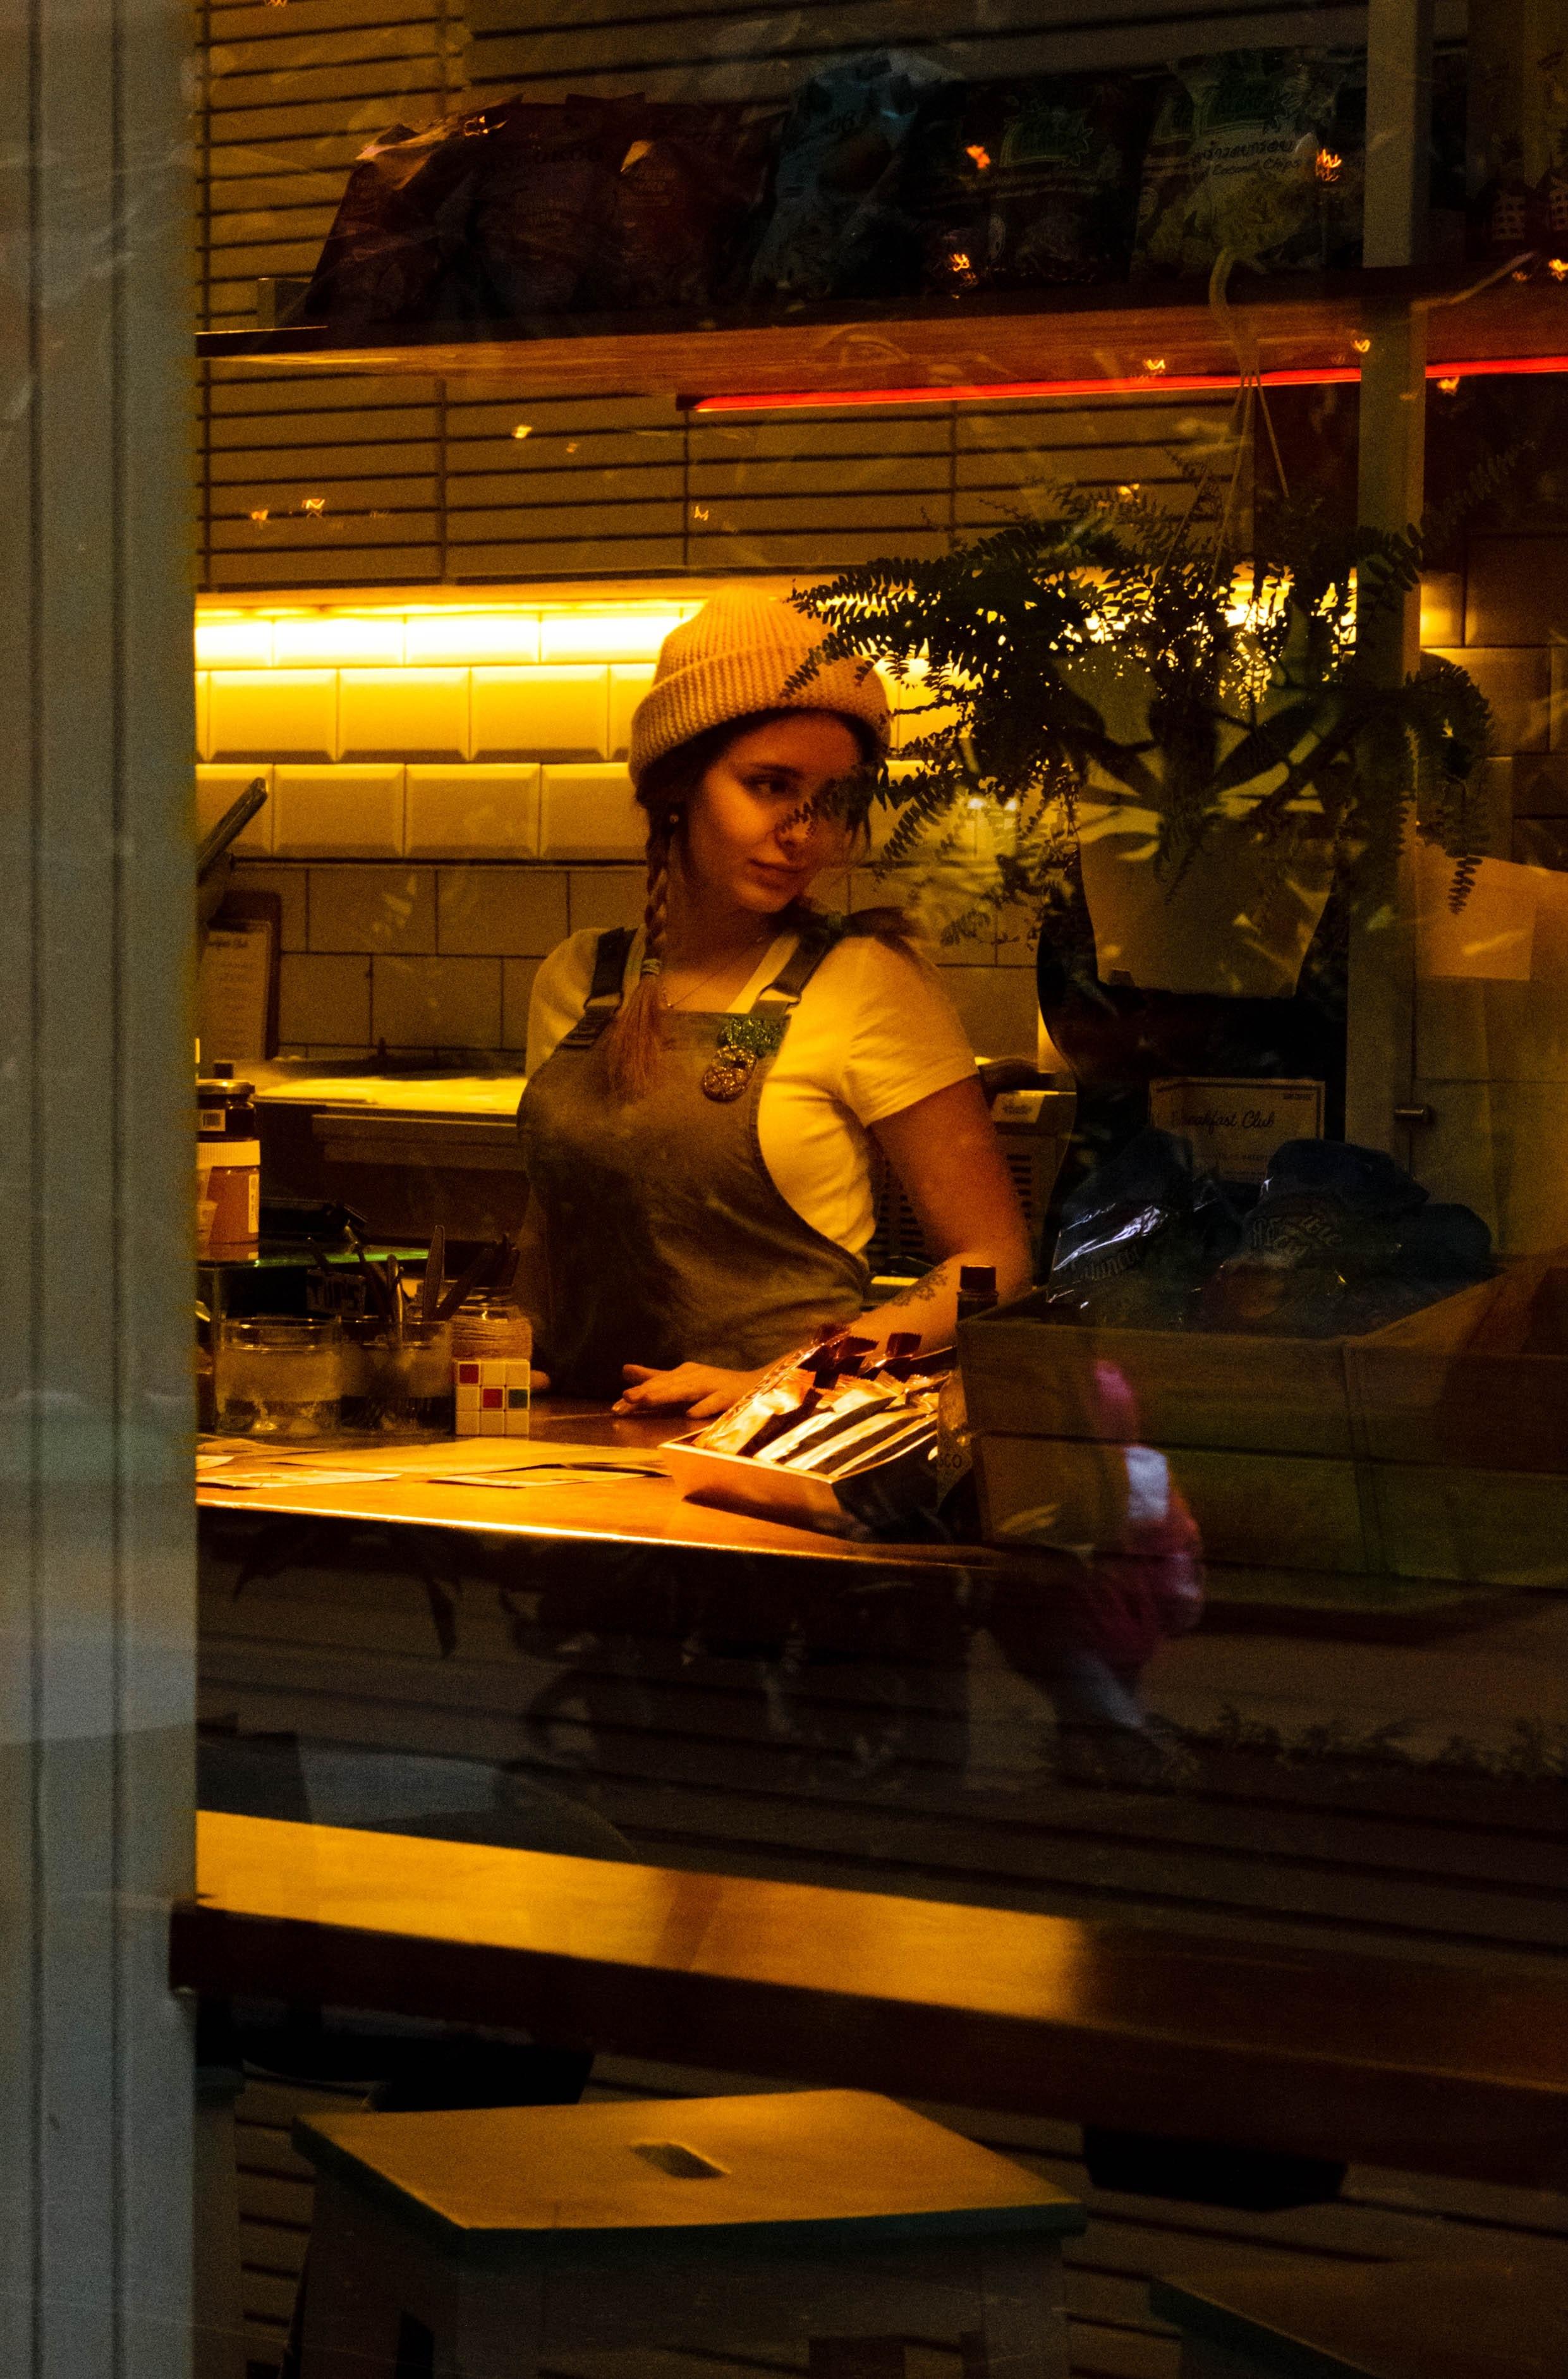 Sharing+Your+Cafe%27s+Kitchen+HospitalityHelpline.com.jpg